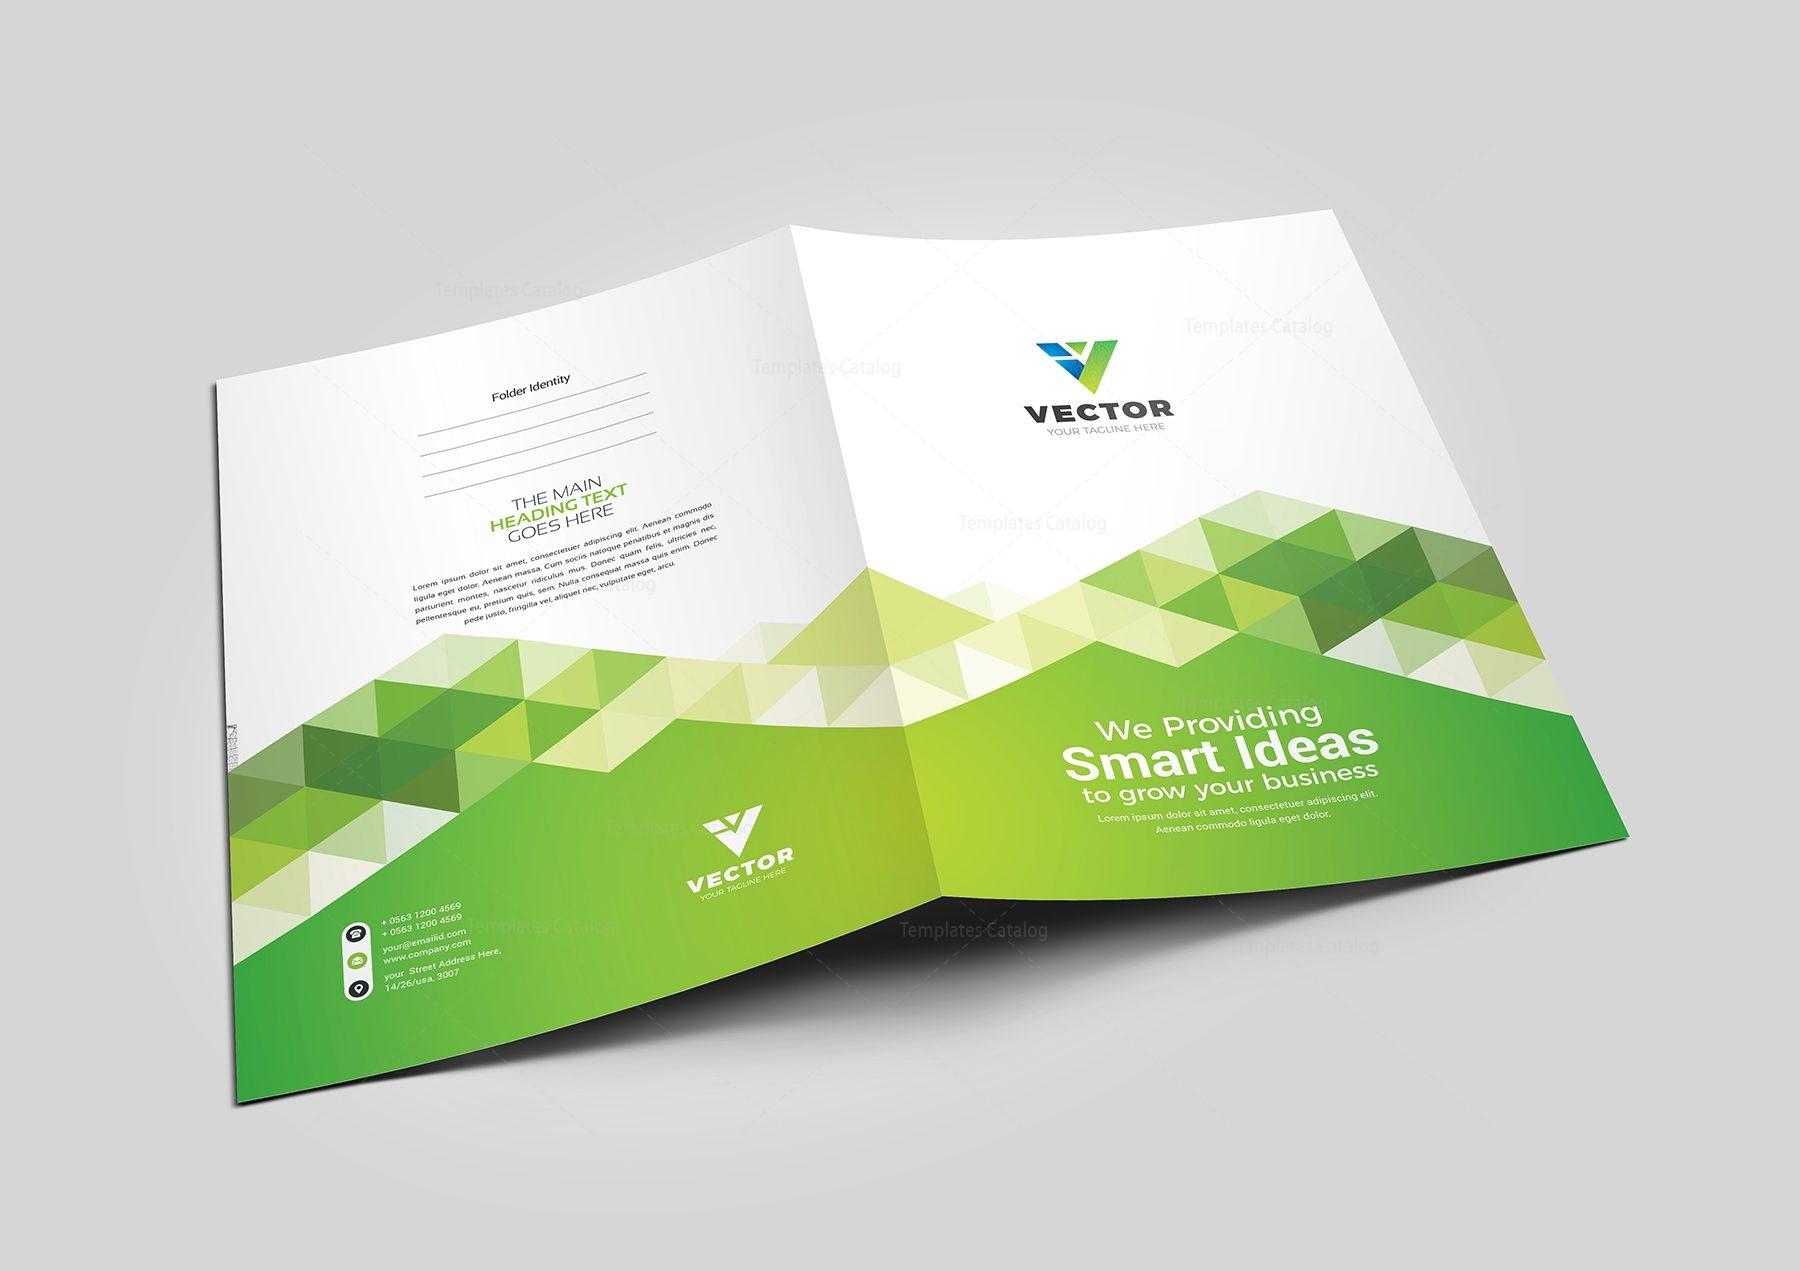 vector presentation folder design template 002173